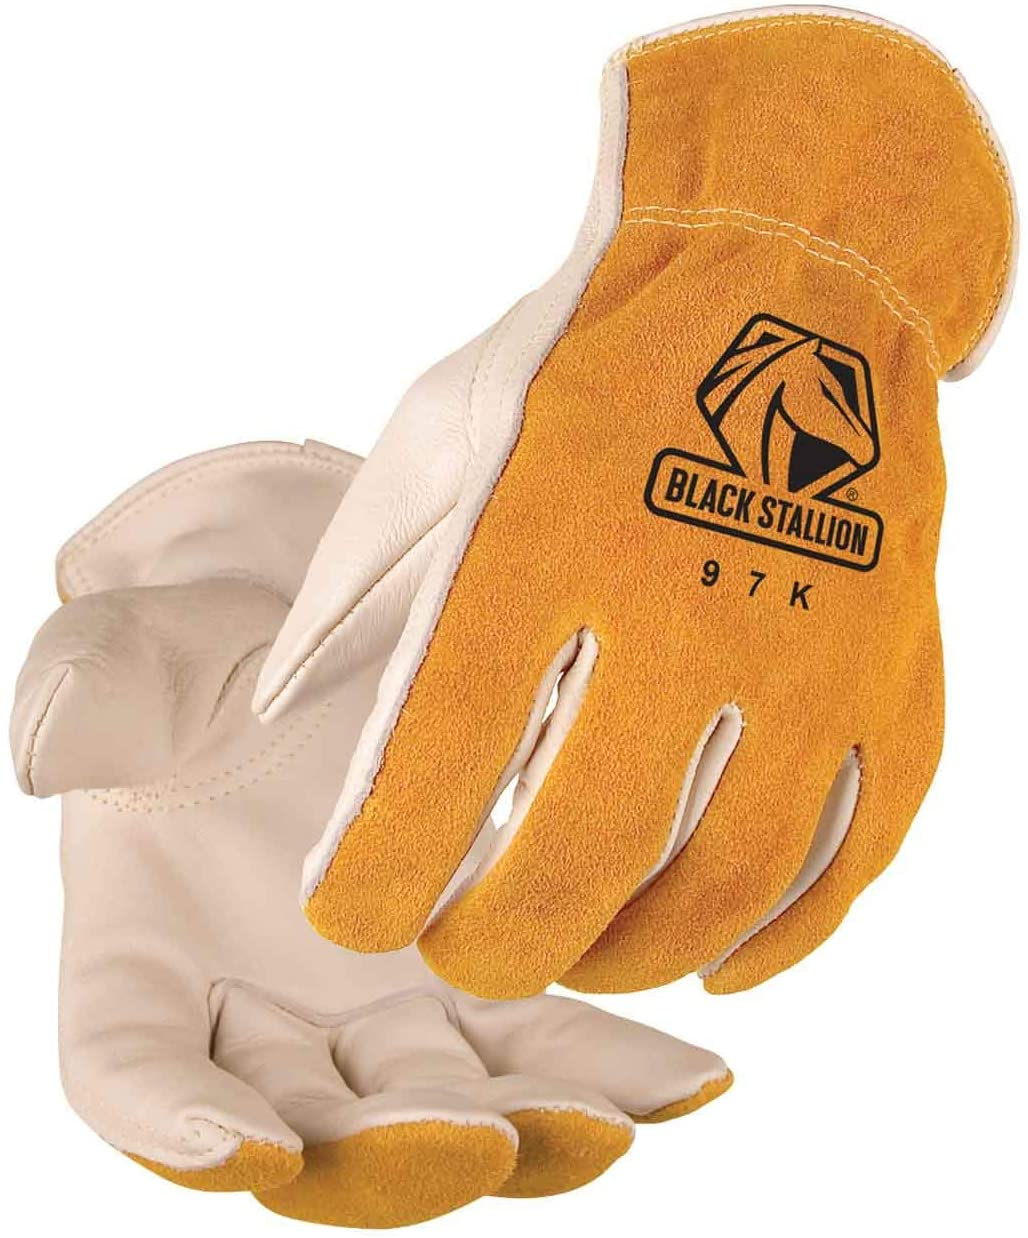 Value Grain/Split Cowhide Kevlar Stitched Driver's Gloves, Size Medium